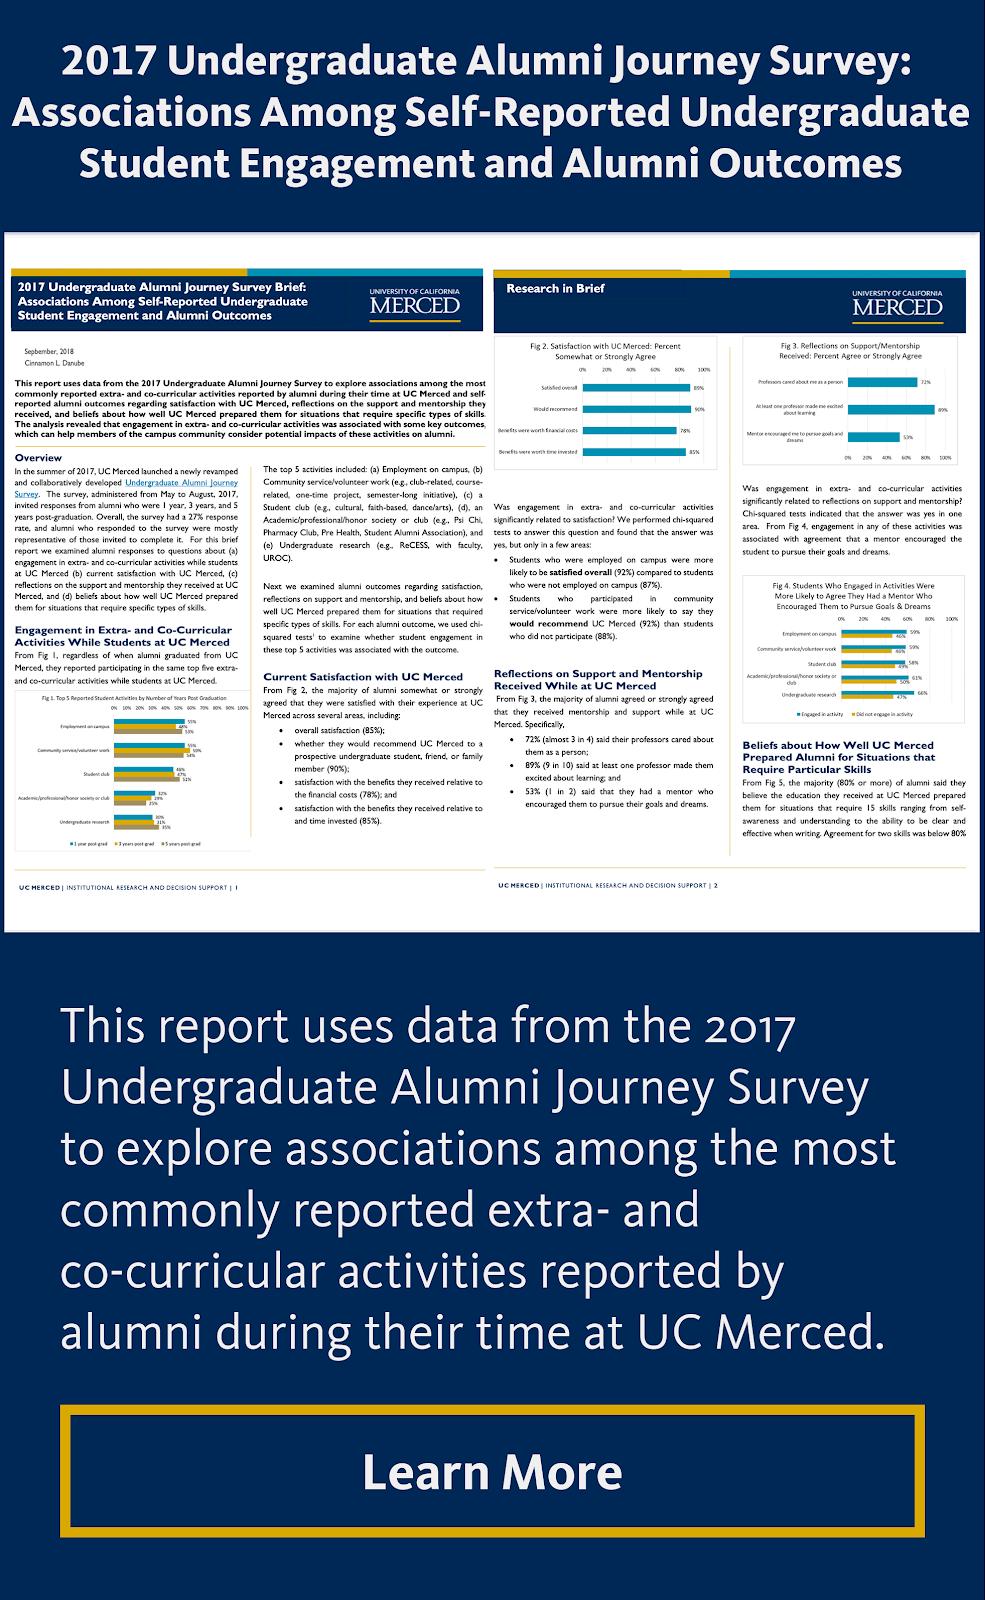 2017 Undergraduate Alumni Journey Survey: Associations Among Self-Reported Undergraduate Student Engagement and Alumni Outcomes